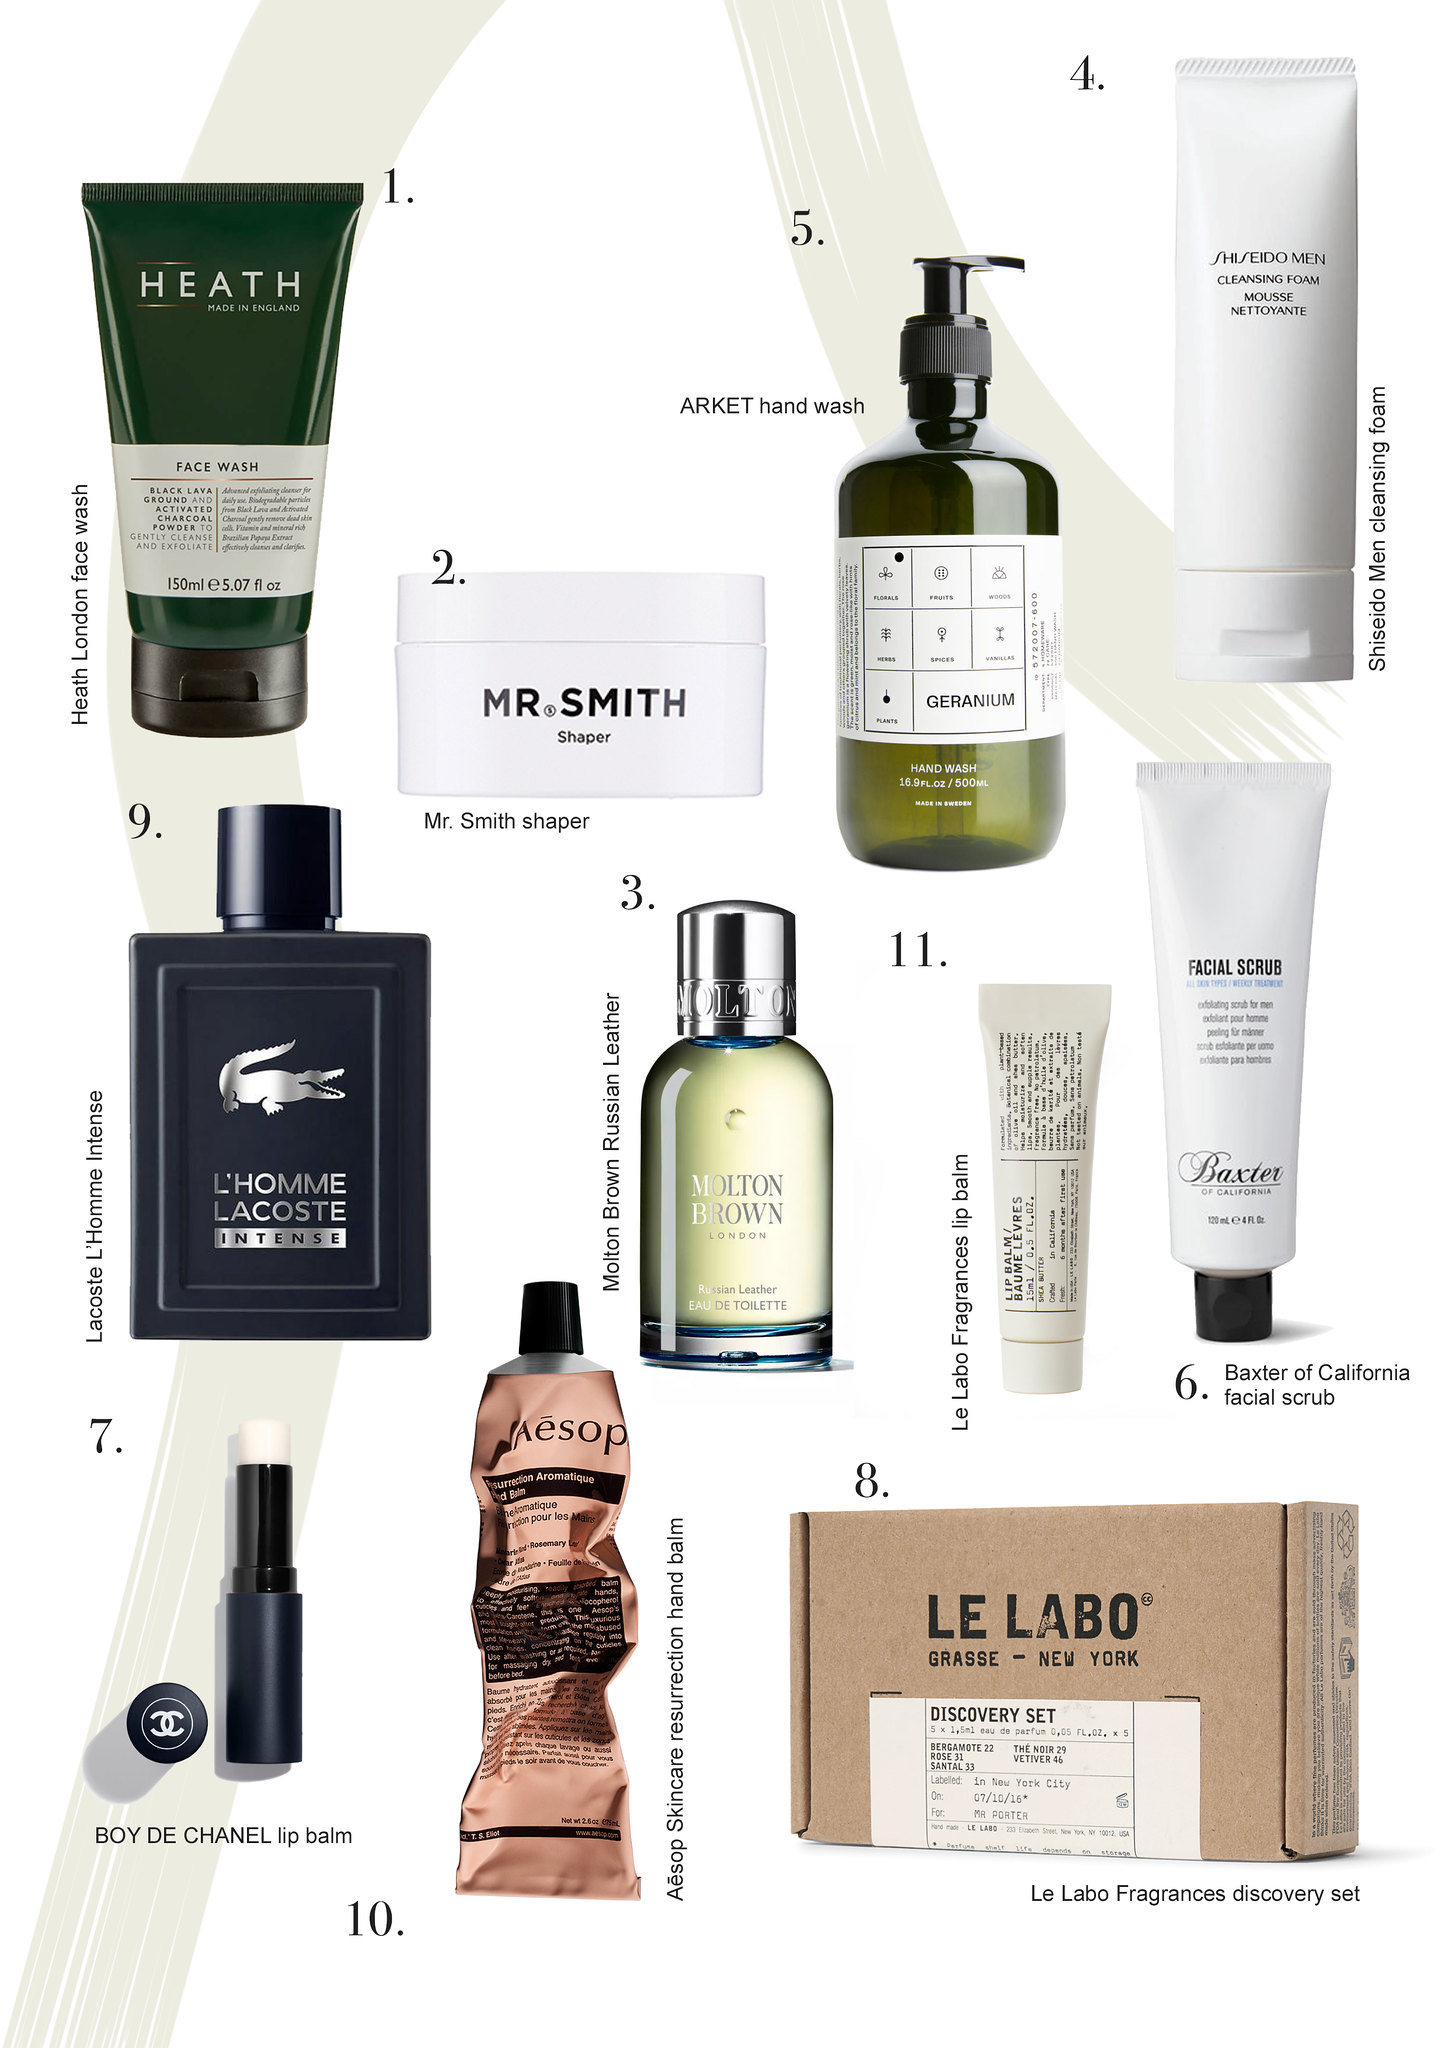 Jordan_Bunker_grooming_gift_guide_1